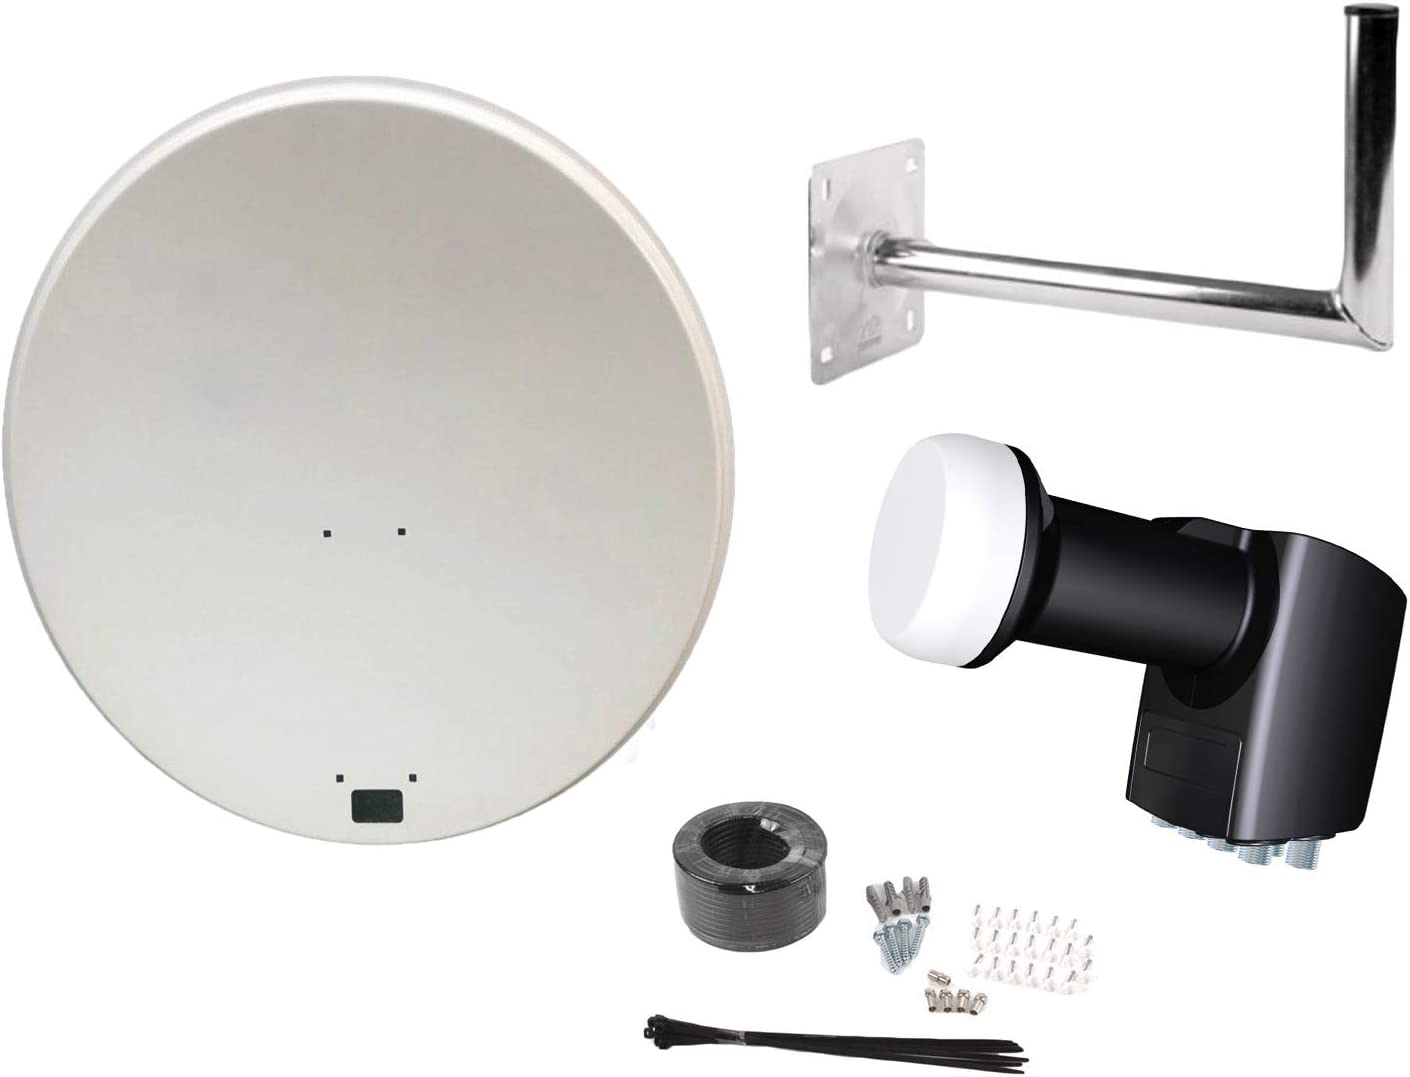 Antena parabólica SAB de 80 cm, antena parabólica, montaje en pared, cable de 20 metros, tornillos, bridas, clips para cables, portaplacas, kit de ...